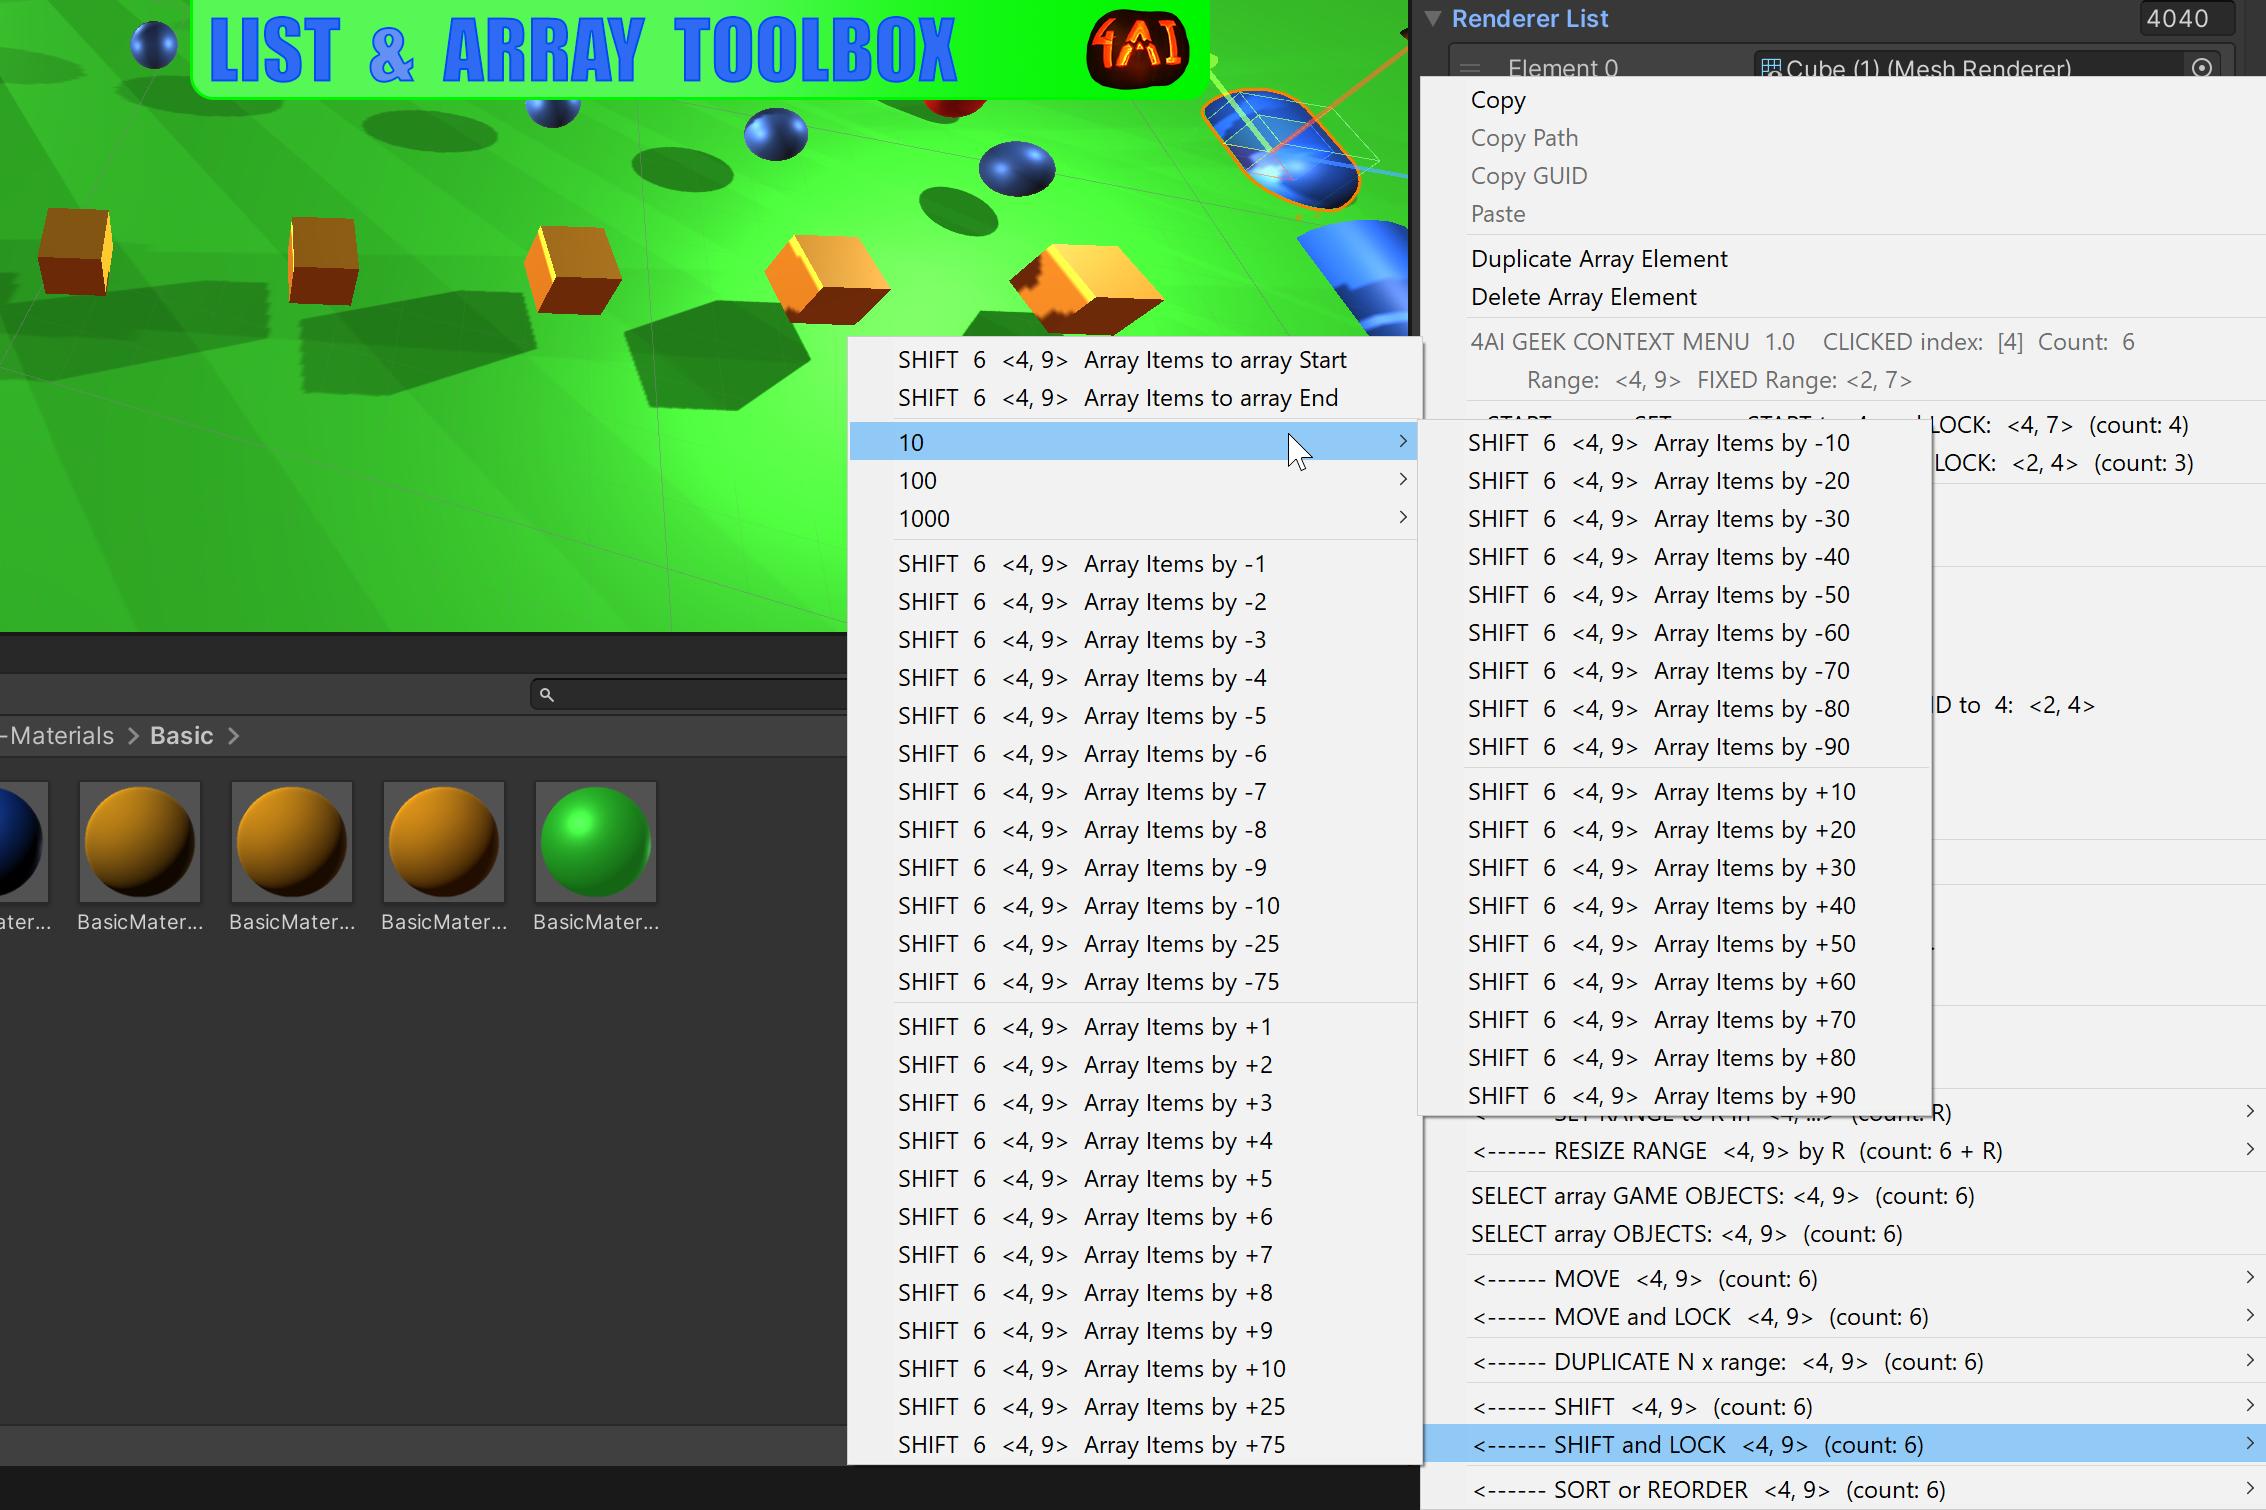 list-array-toolbox-95.png